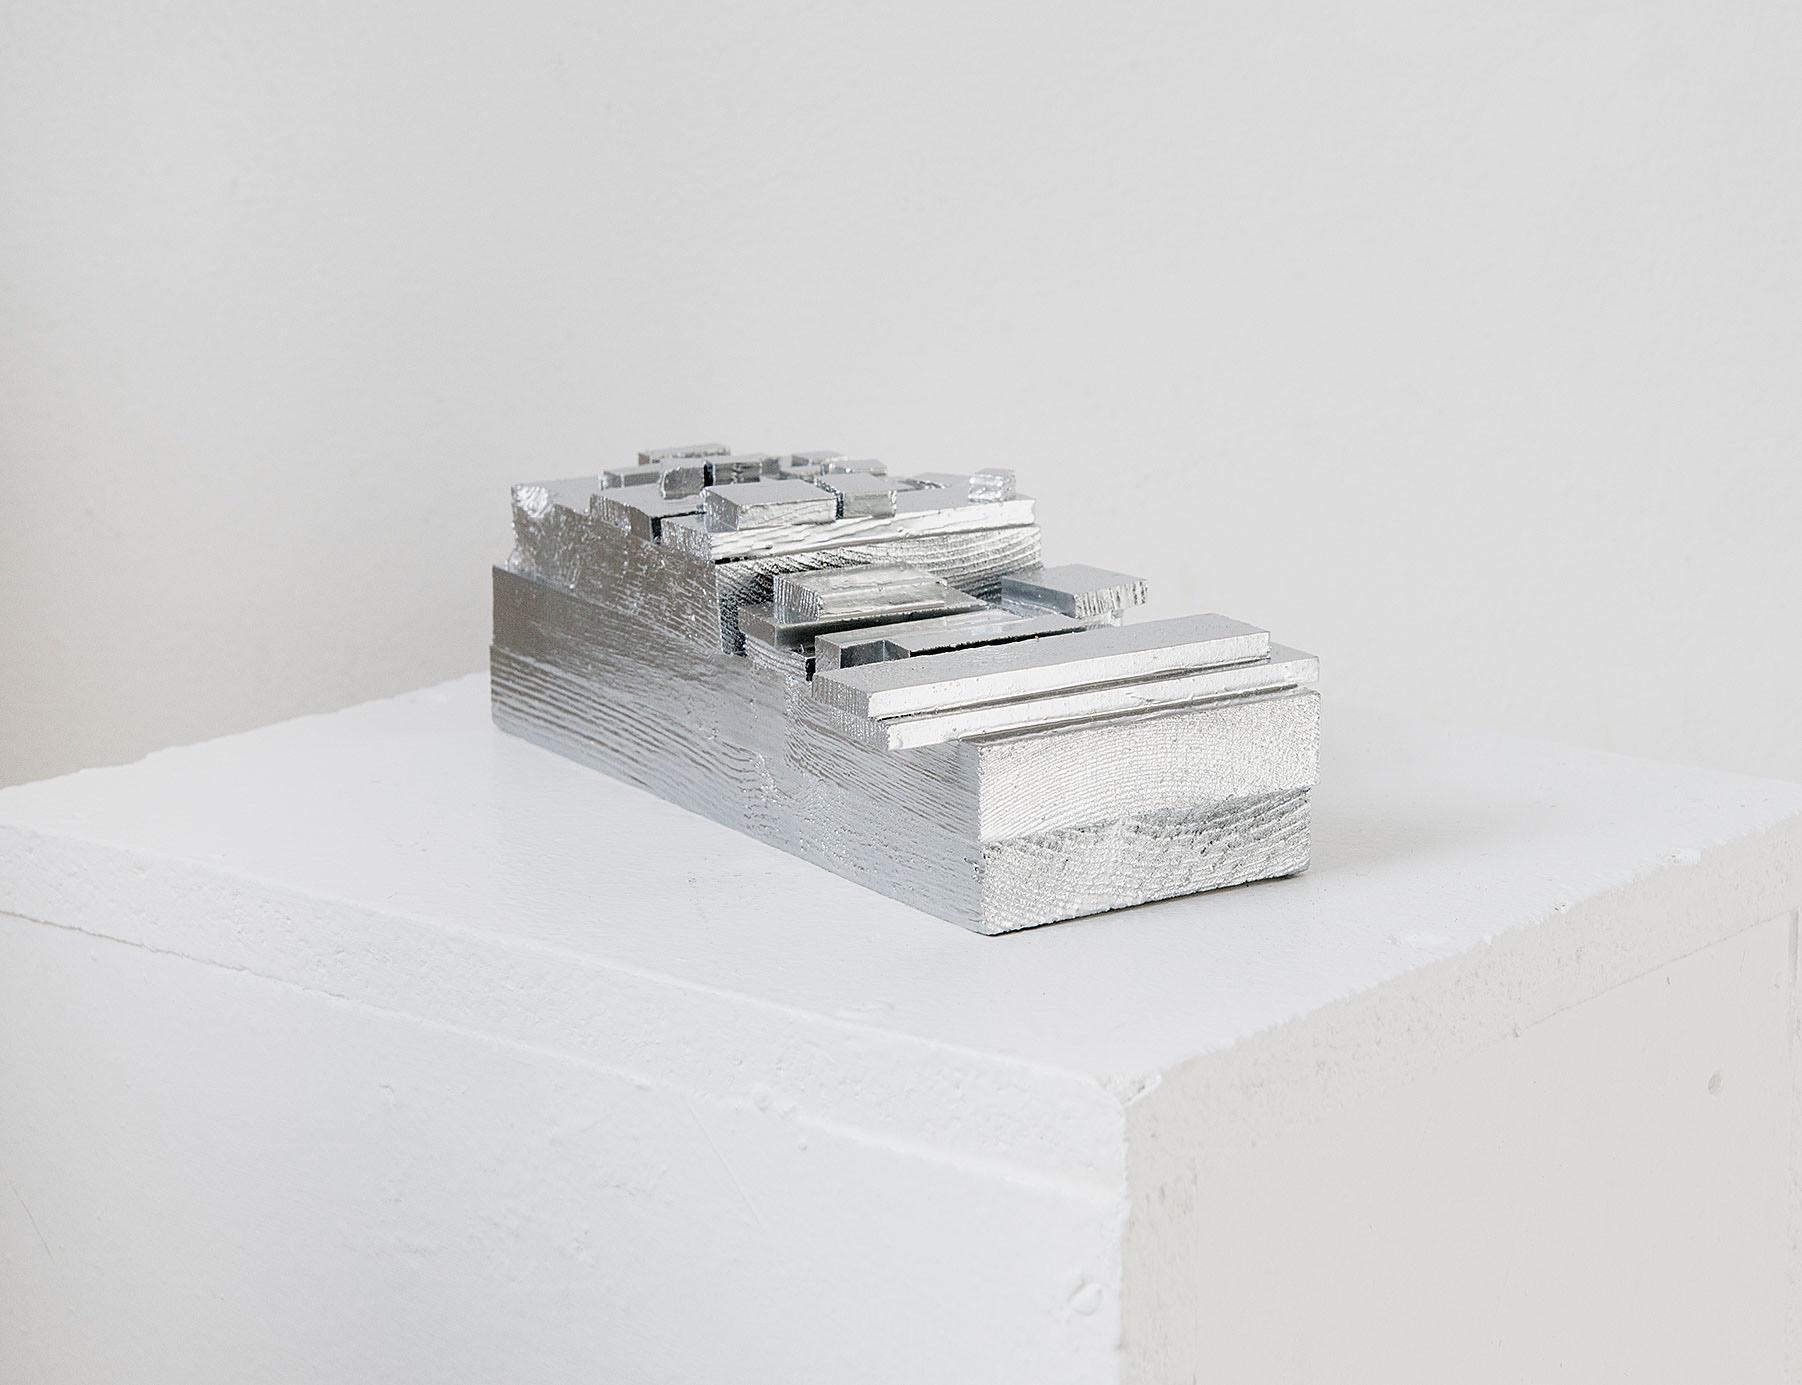 o.T._2017 Lack_Holz_7 x 20 x 10 cm